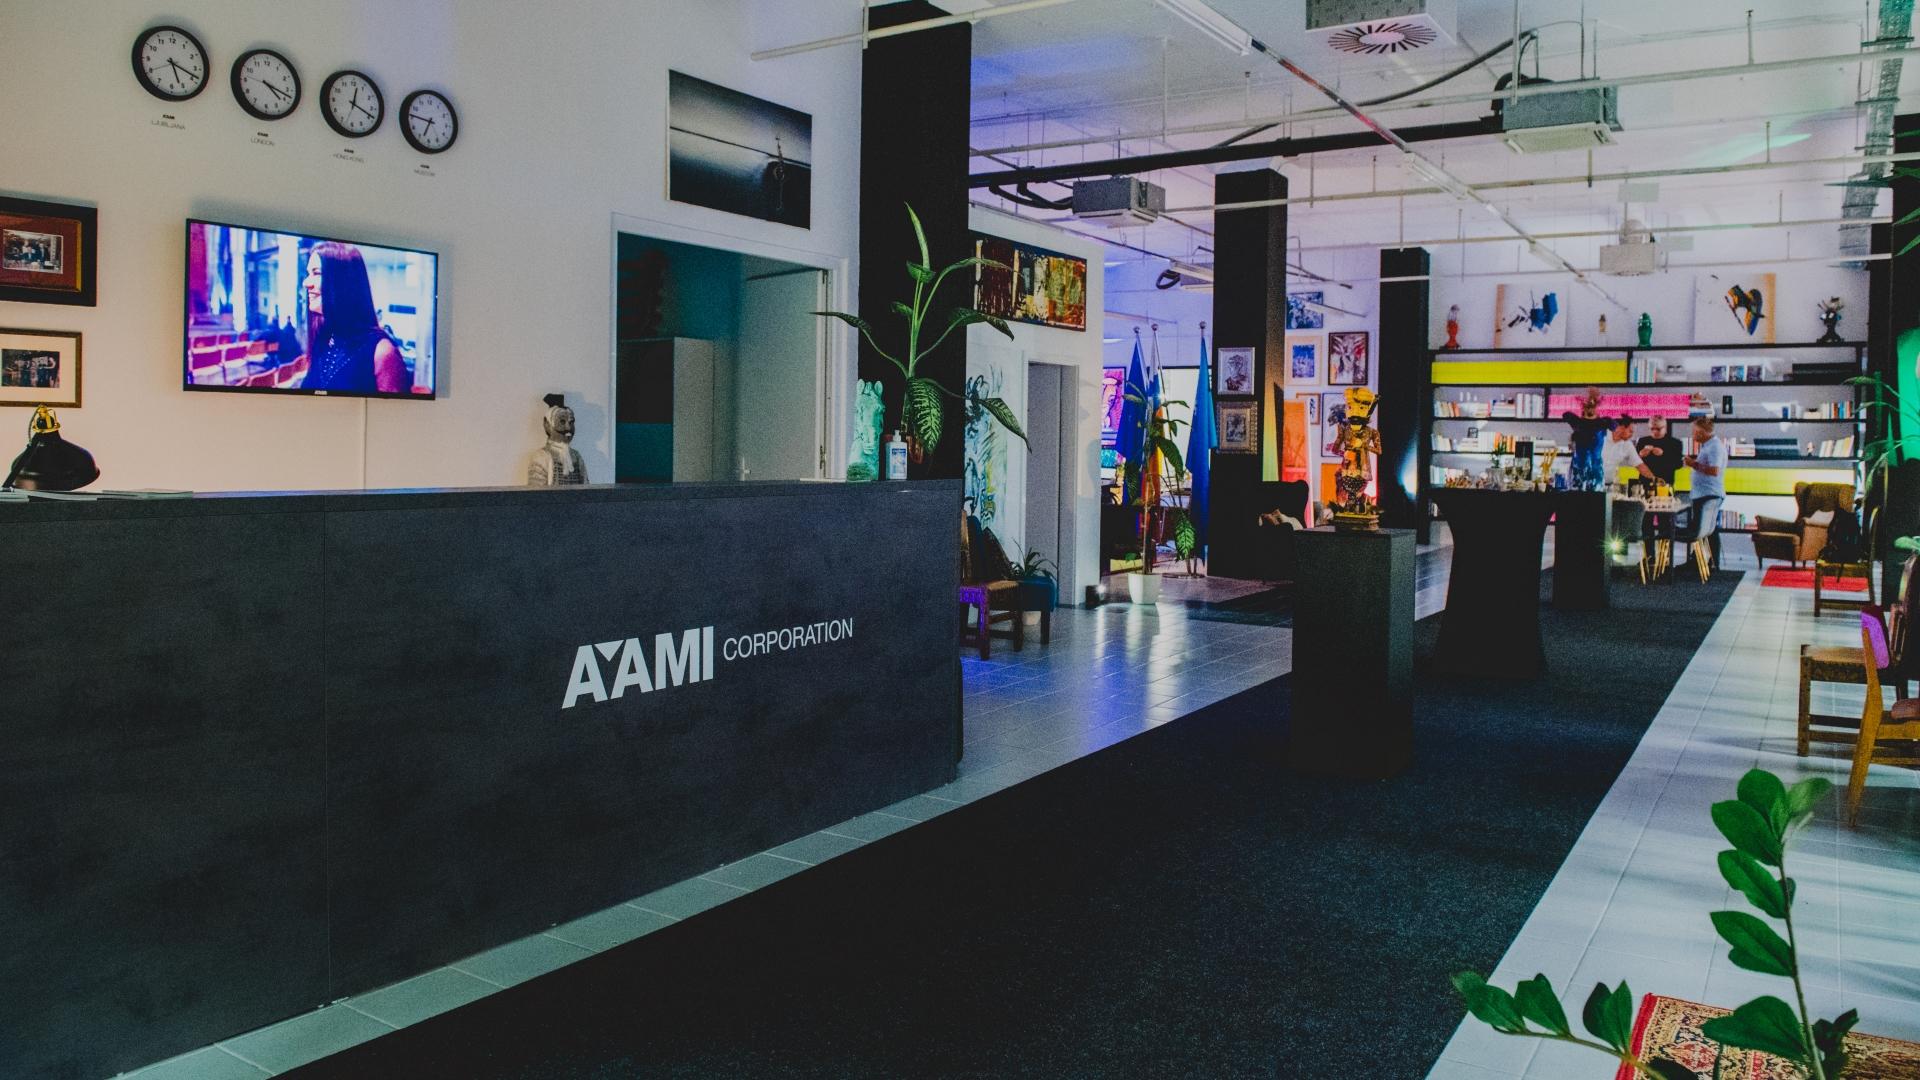 AAMI Corporation